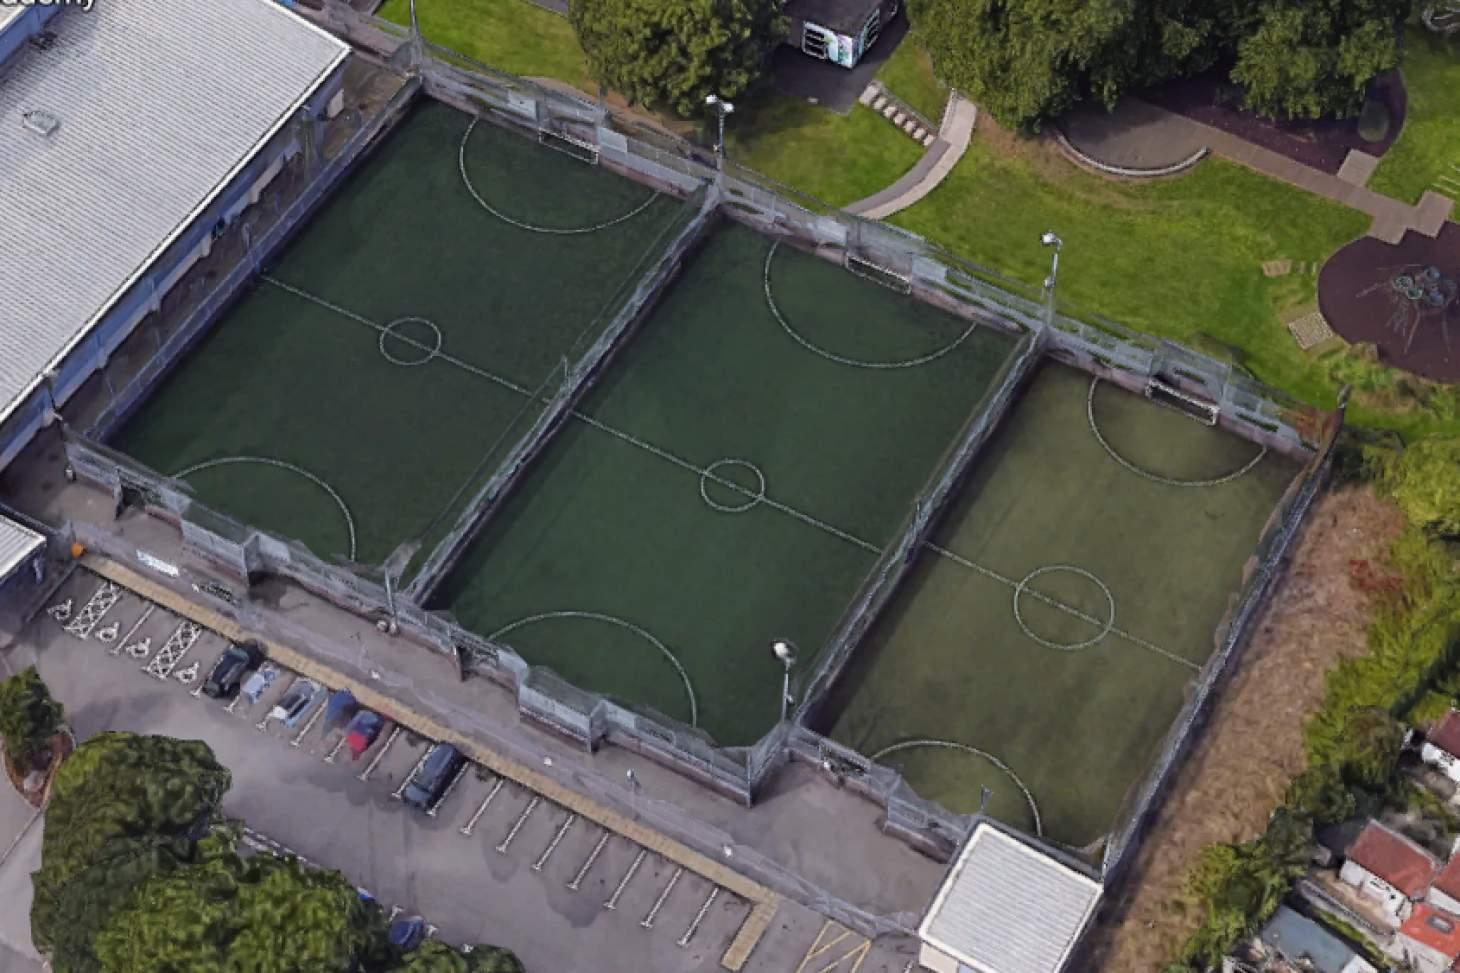 PlayFootball Bristol St Pauls 6 a side | 3G Astroturf football pitch